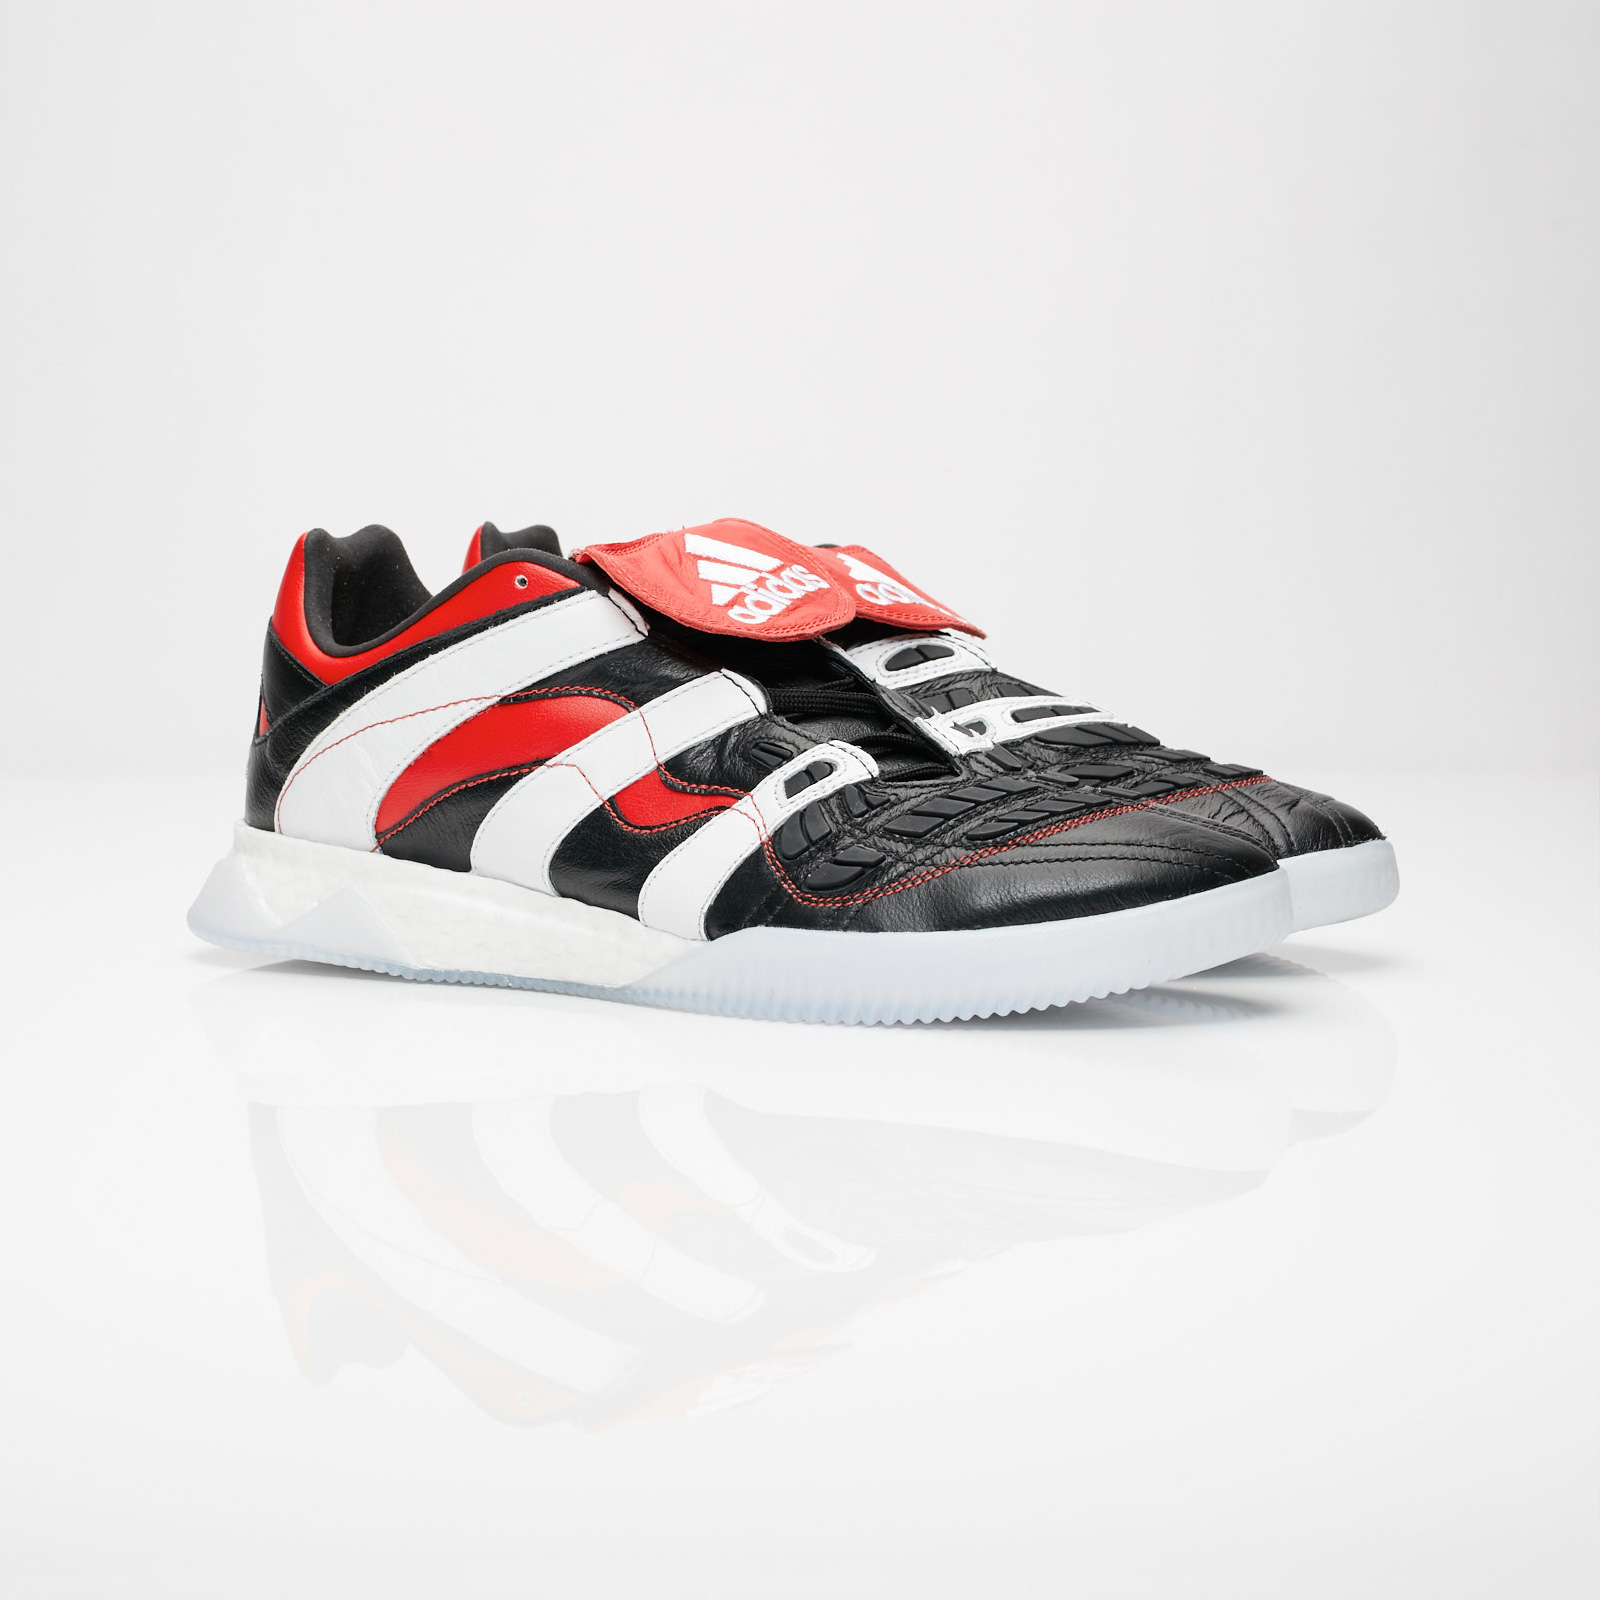 97b67f6a41f6 adidas Predator Accelerator TR - D96670 - Sneakersnstuff